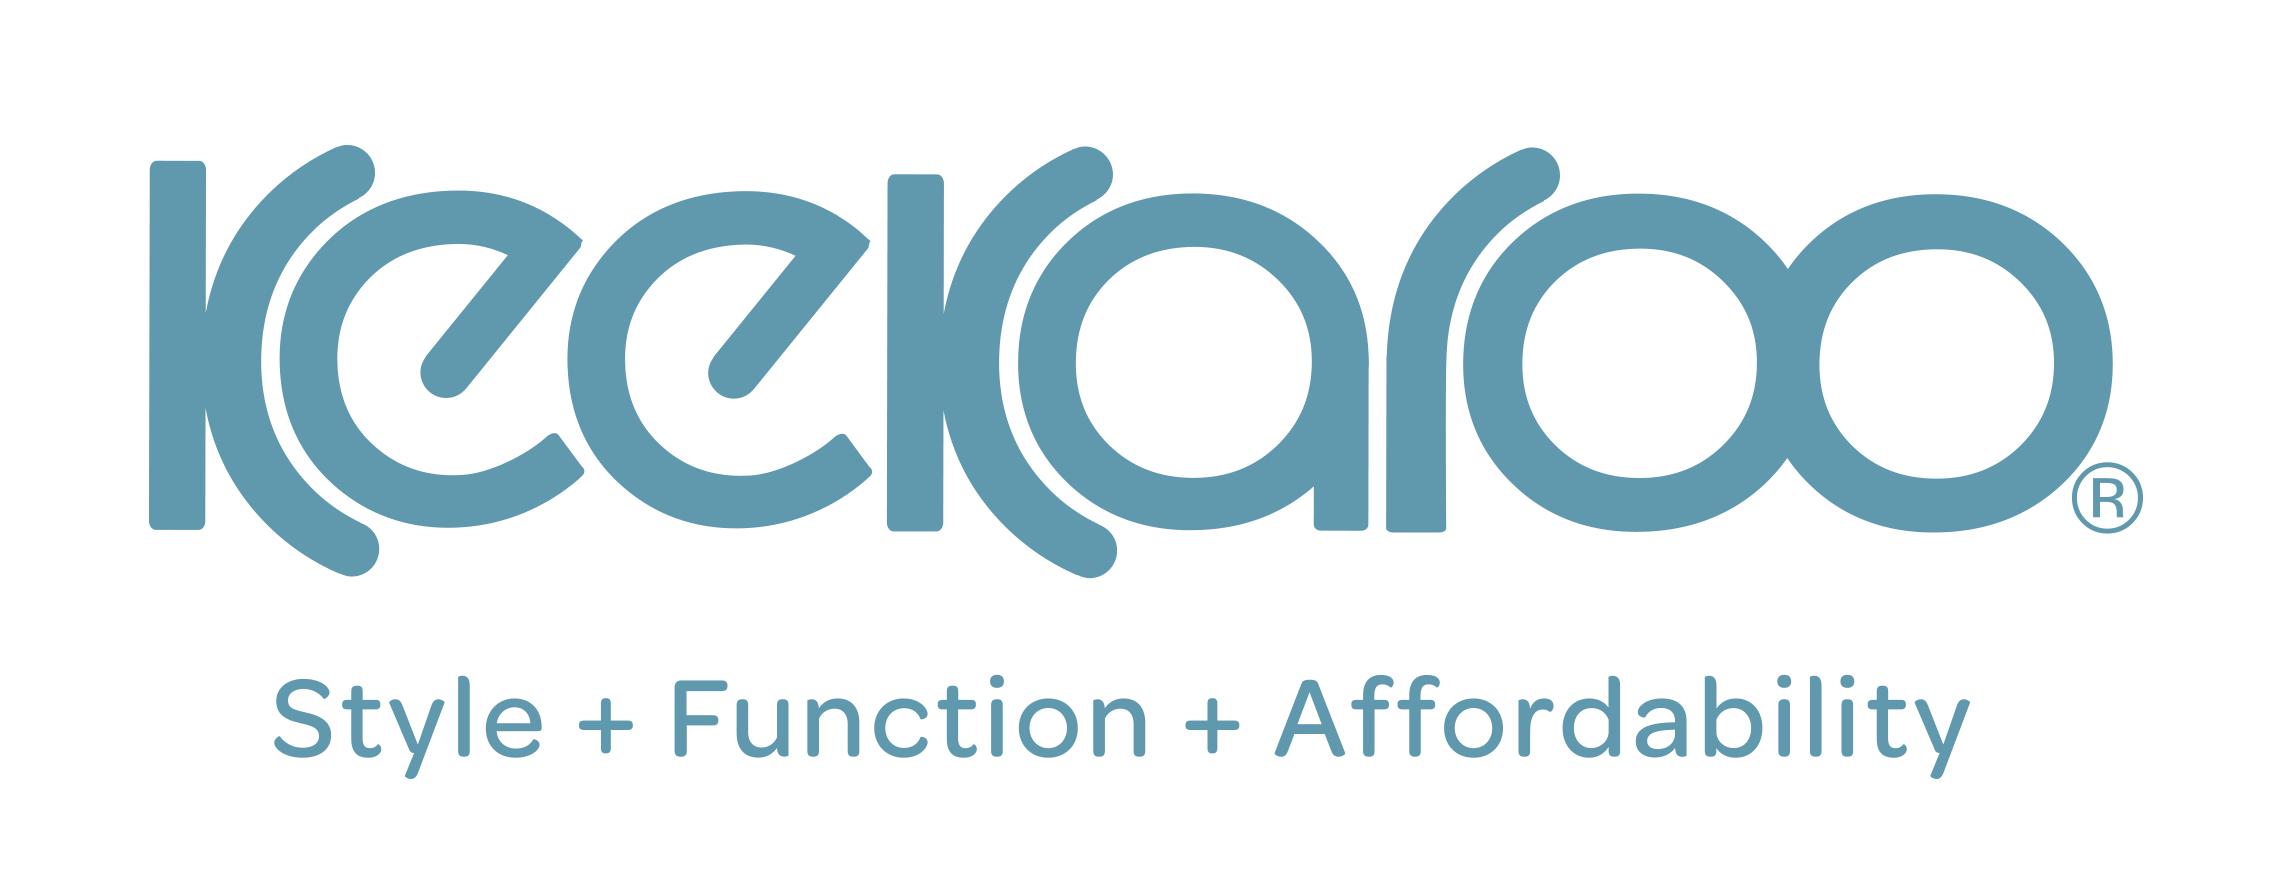 dark-blue-keekaroo-logo-tagline.png